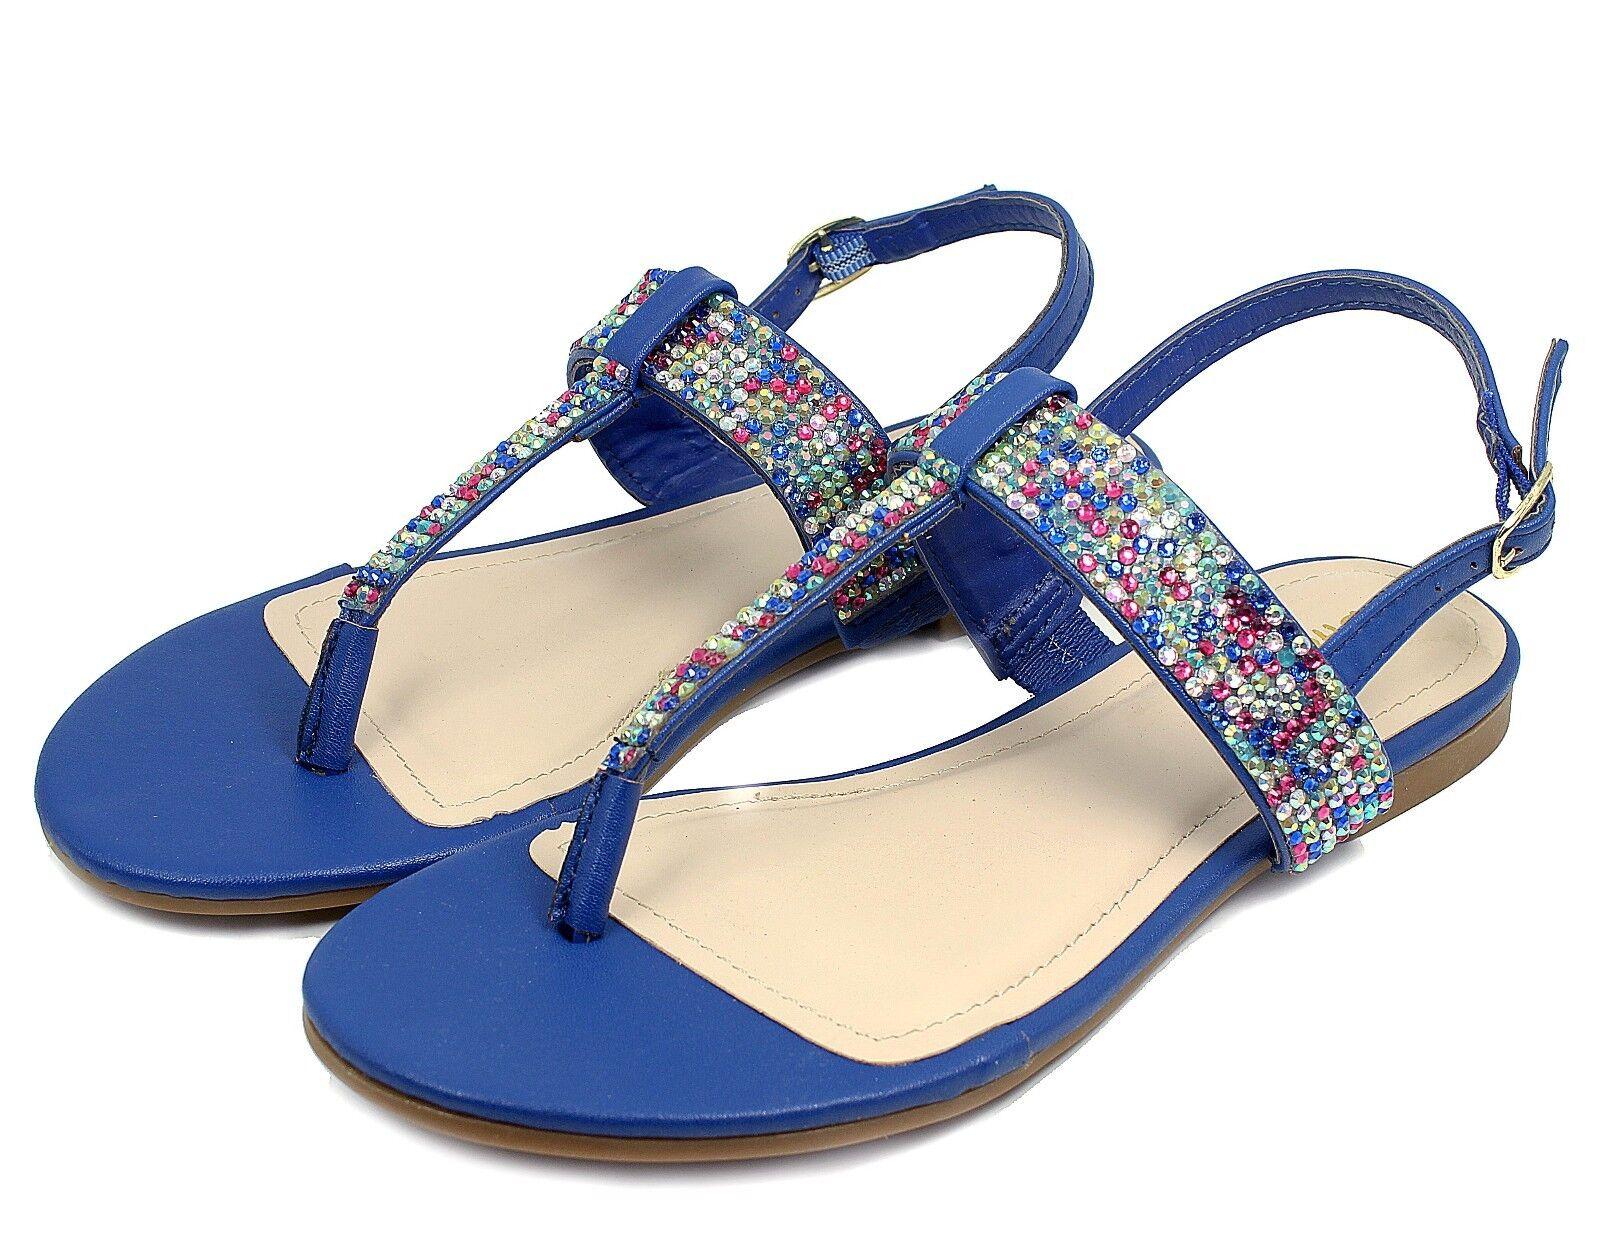 JOSALYN-22 Fushion Women Bead Flat T-Strap Cute Sandals Party Women Fushion Shoes Blue 8.5 bc240c